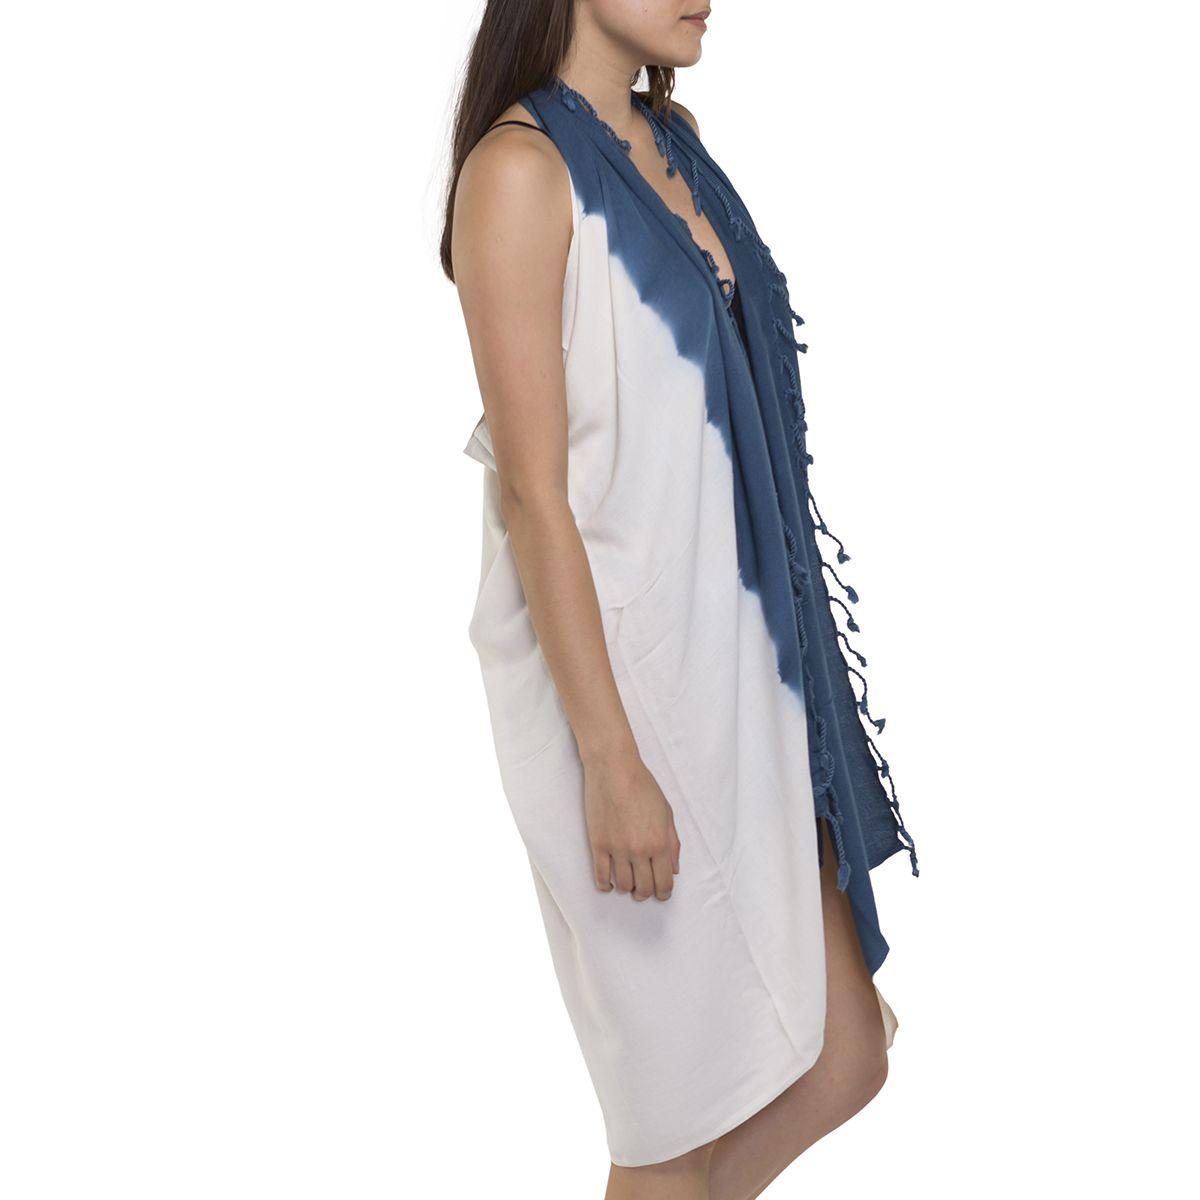 Pareo - Tie Dye / Edges Petrol Blue